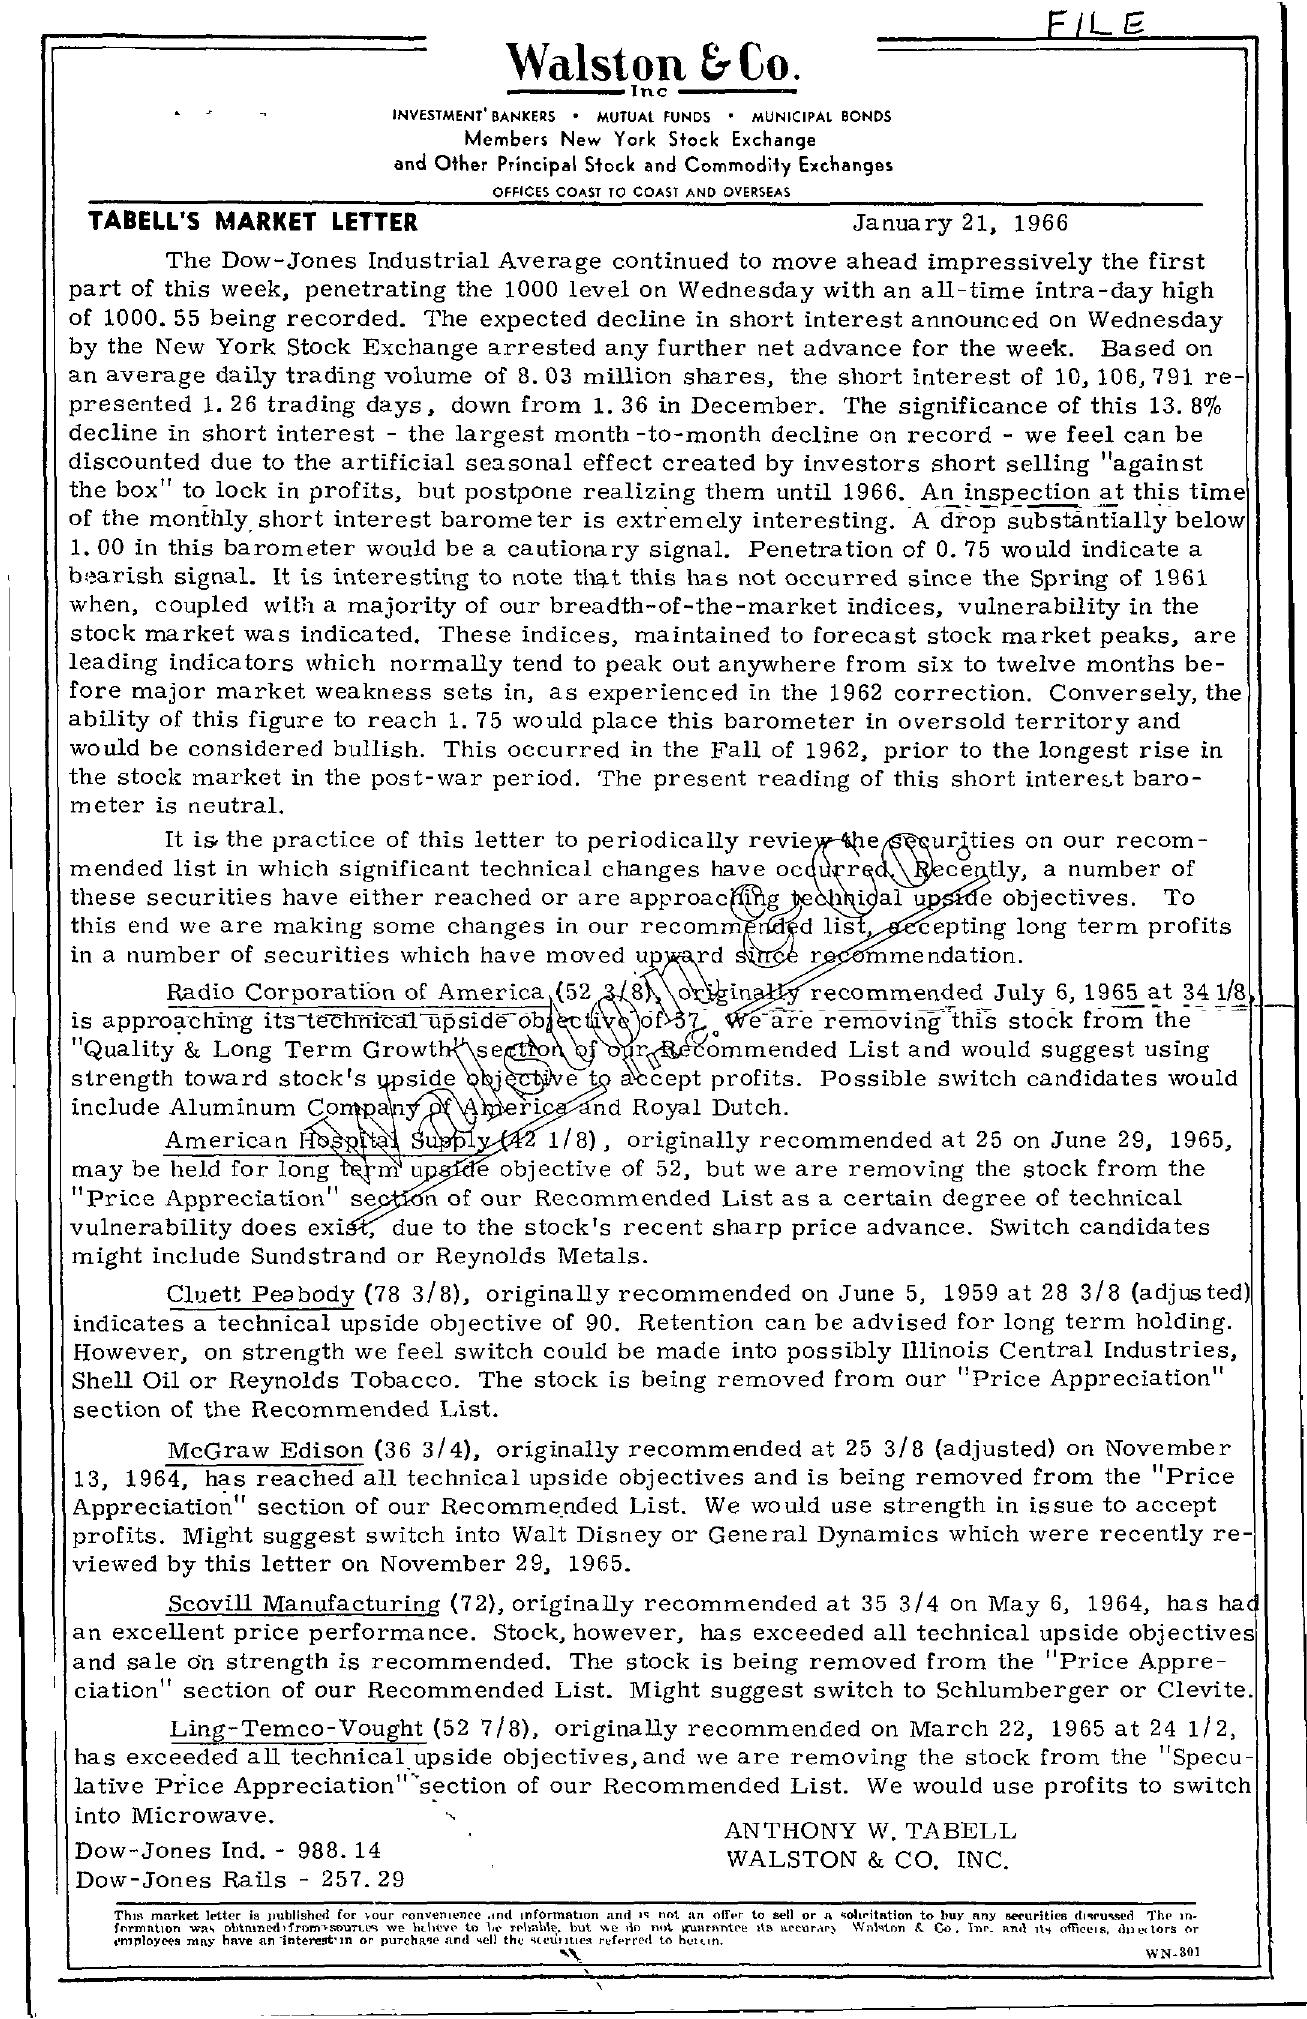 Tabell's Market Letter - January 21, 1966